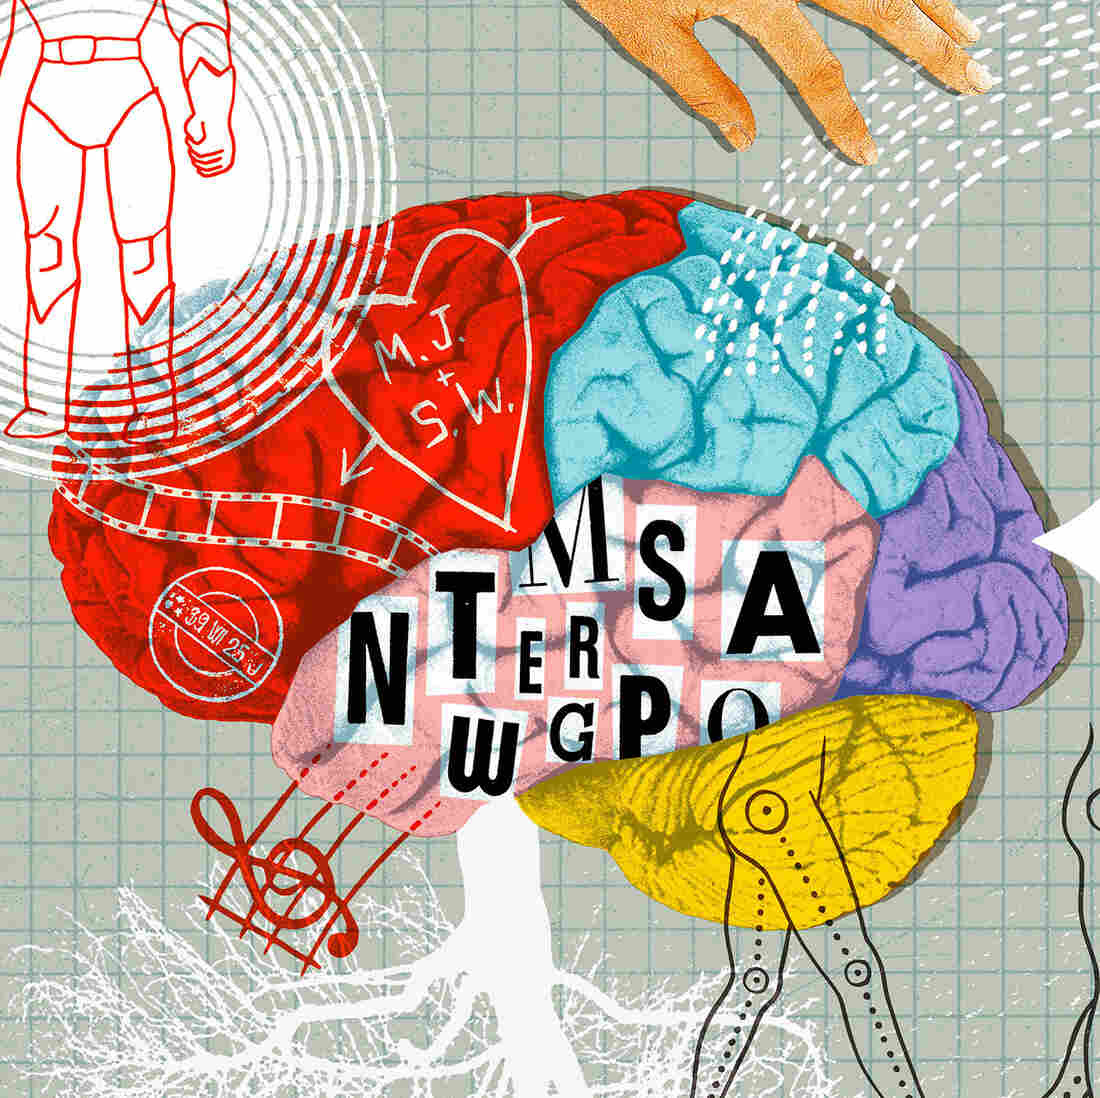 Women's Brains Appear More Vulnerable To Alzheimer's Than Men's